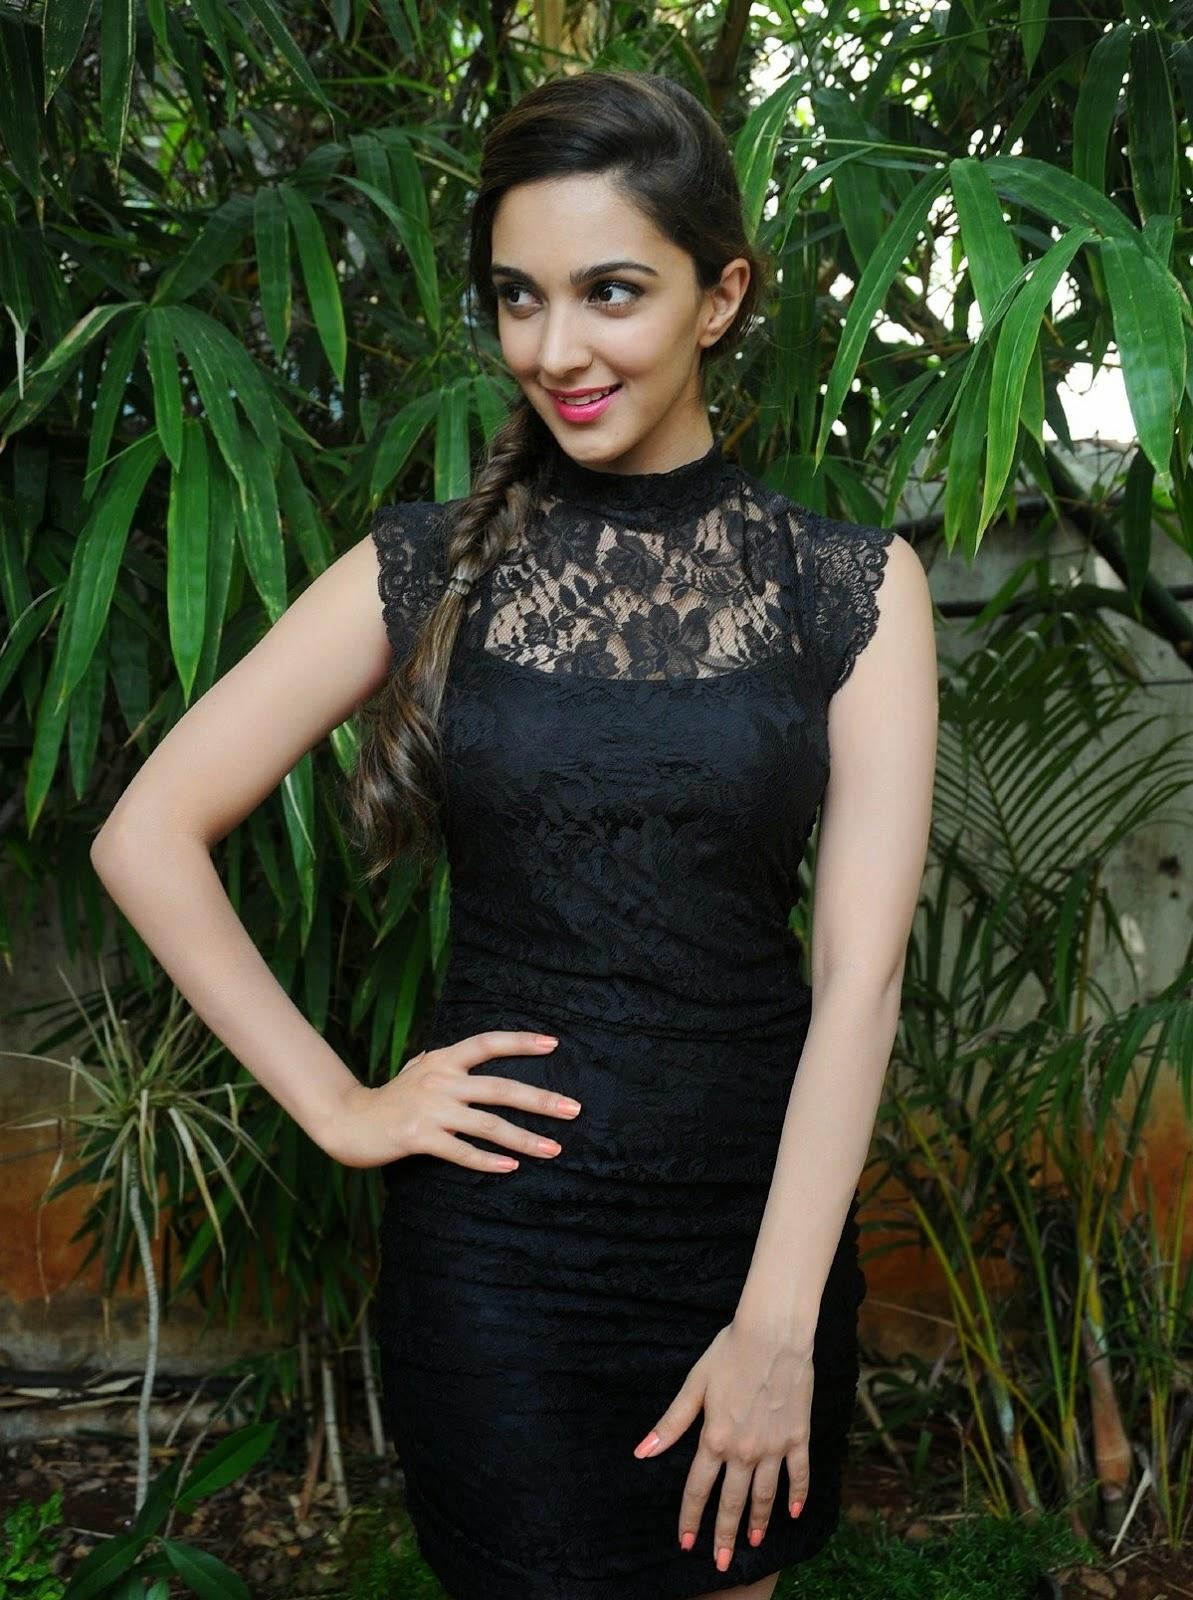 High Quality Bollywood Celebrity Pictures Kiara Advani -6848